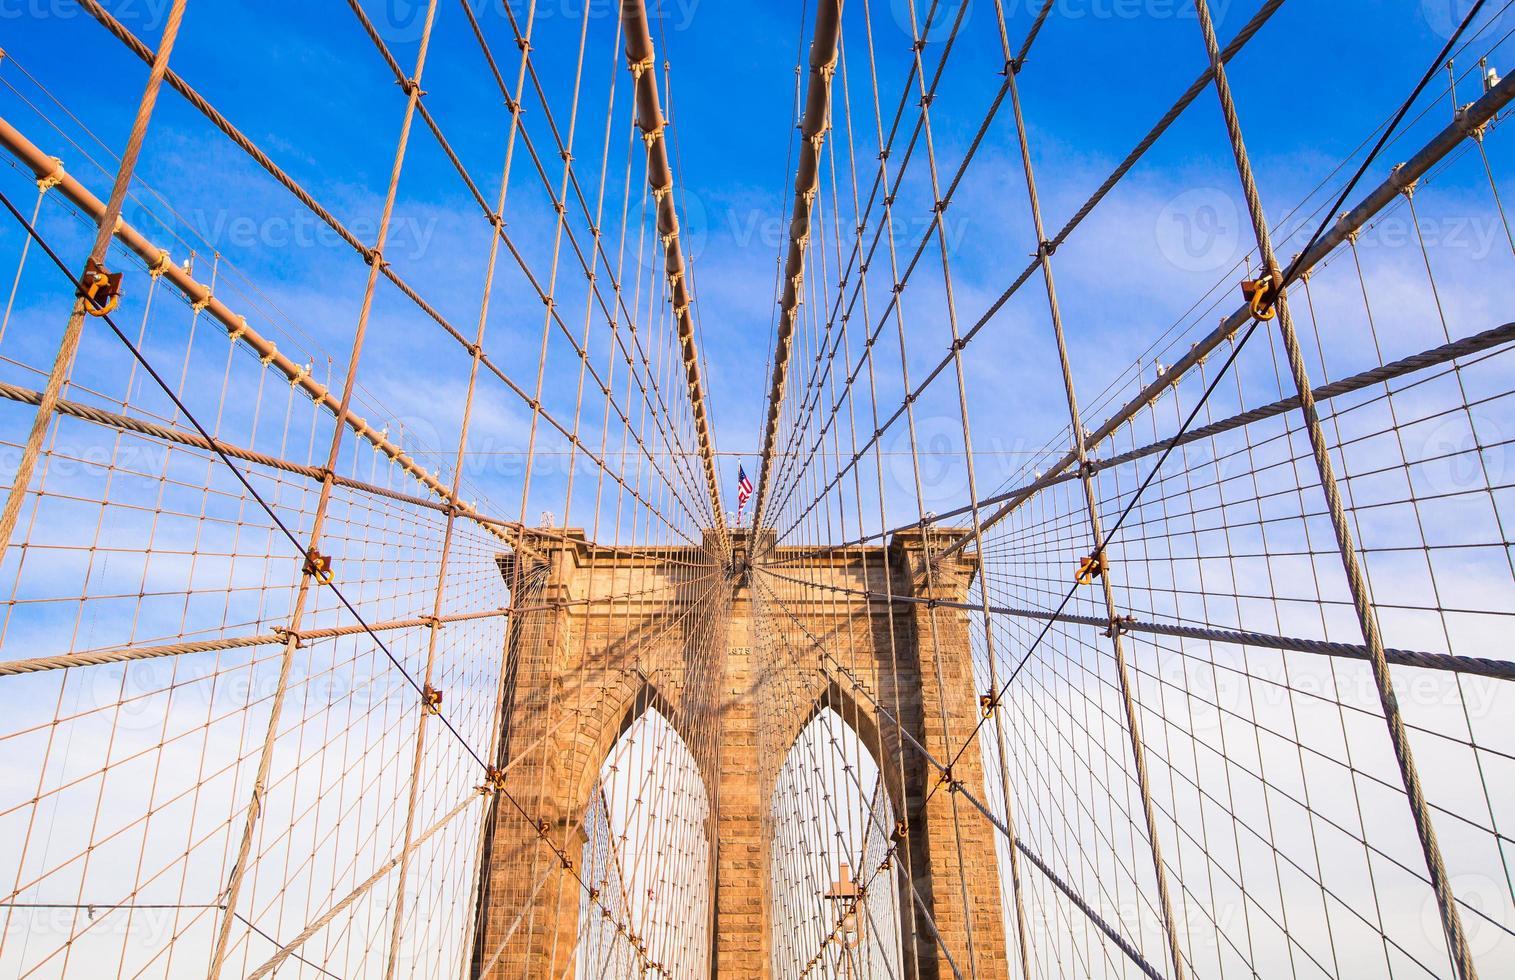 le pont de brooklyn, new york city, usa photo